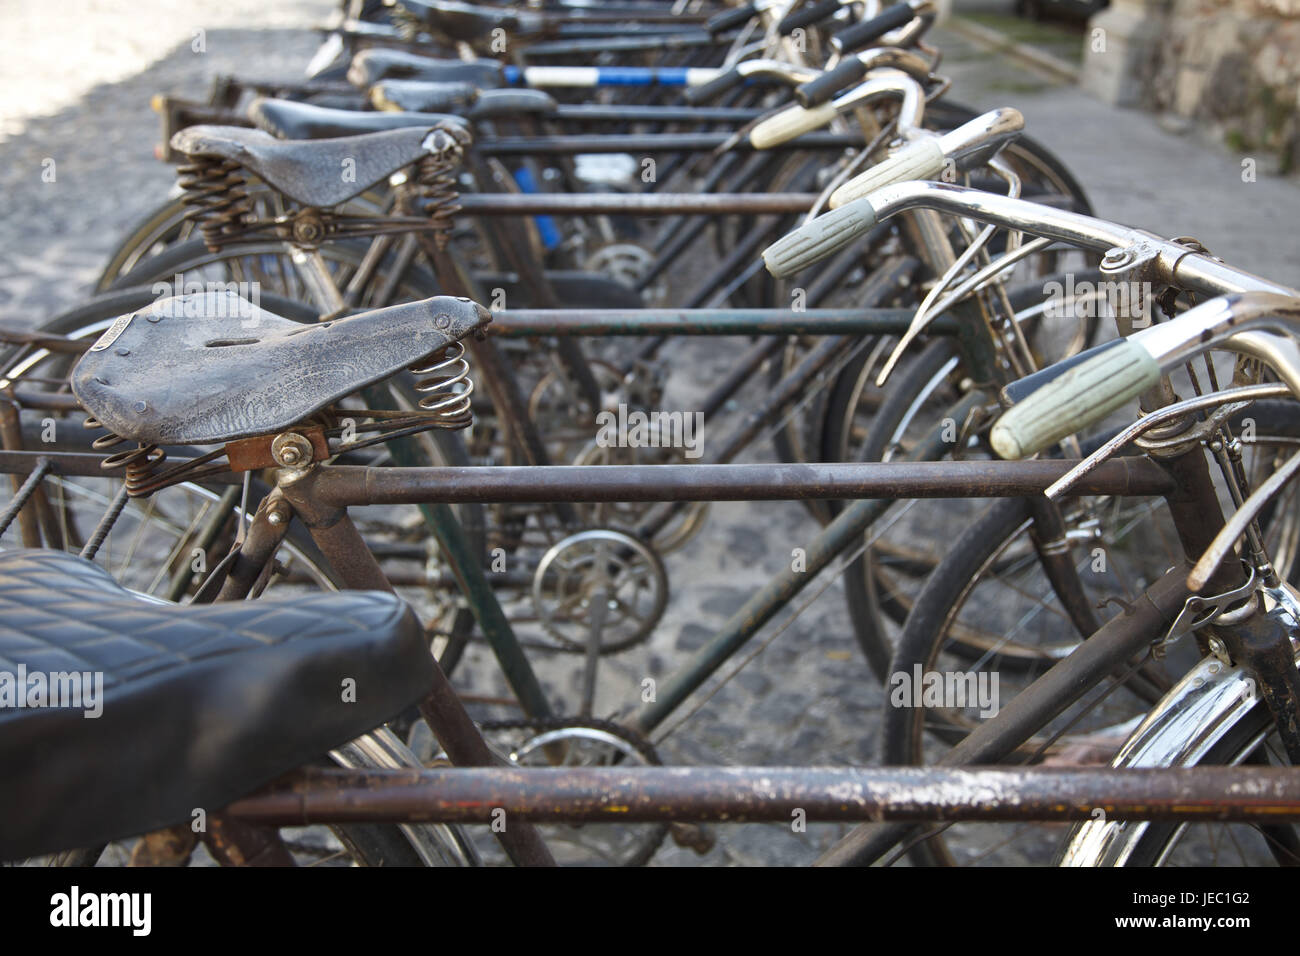 Guatemala, Antigua Guatemala, bicycles, alto, - Stock Image